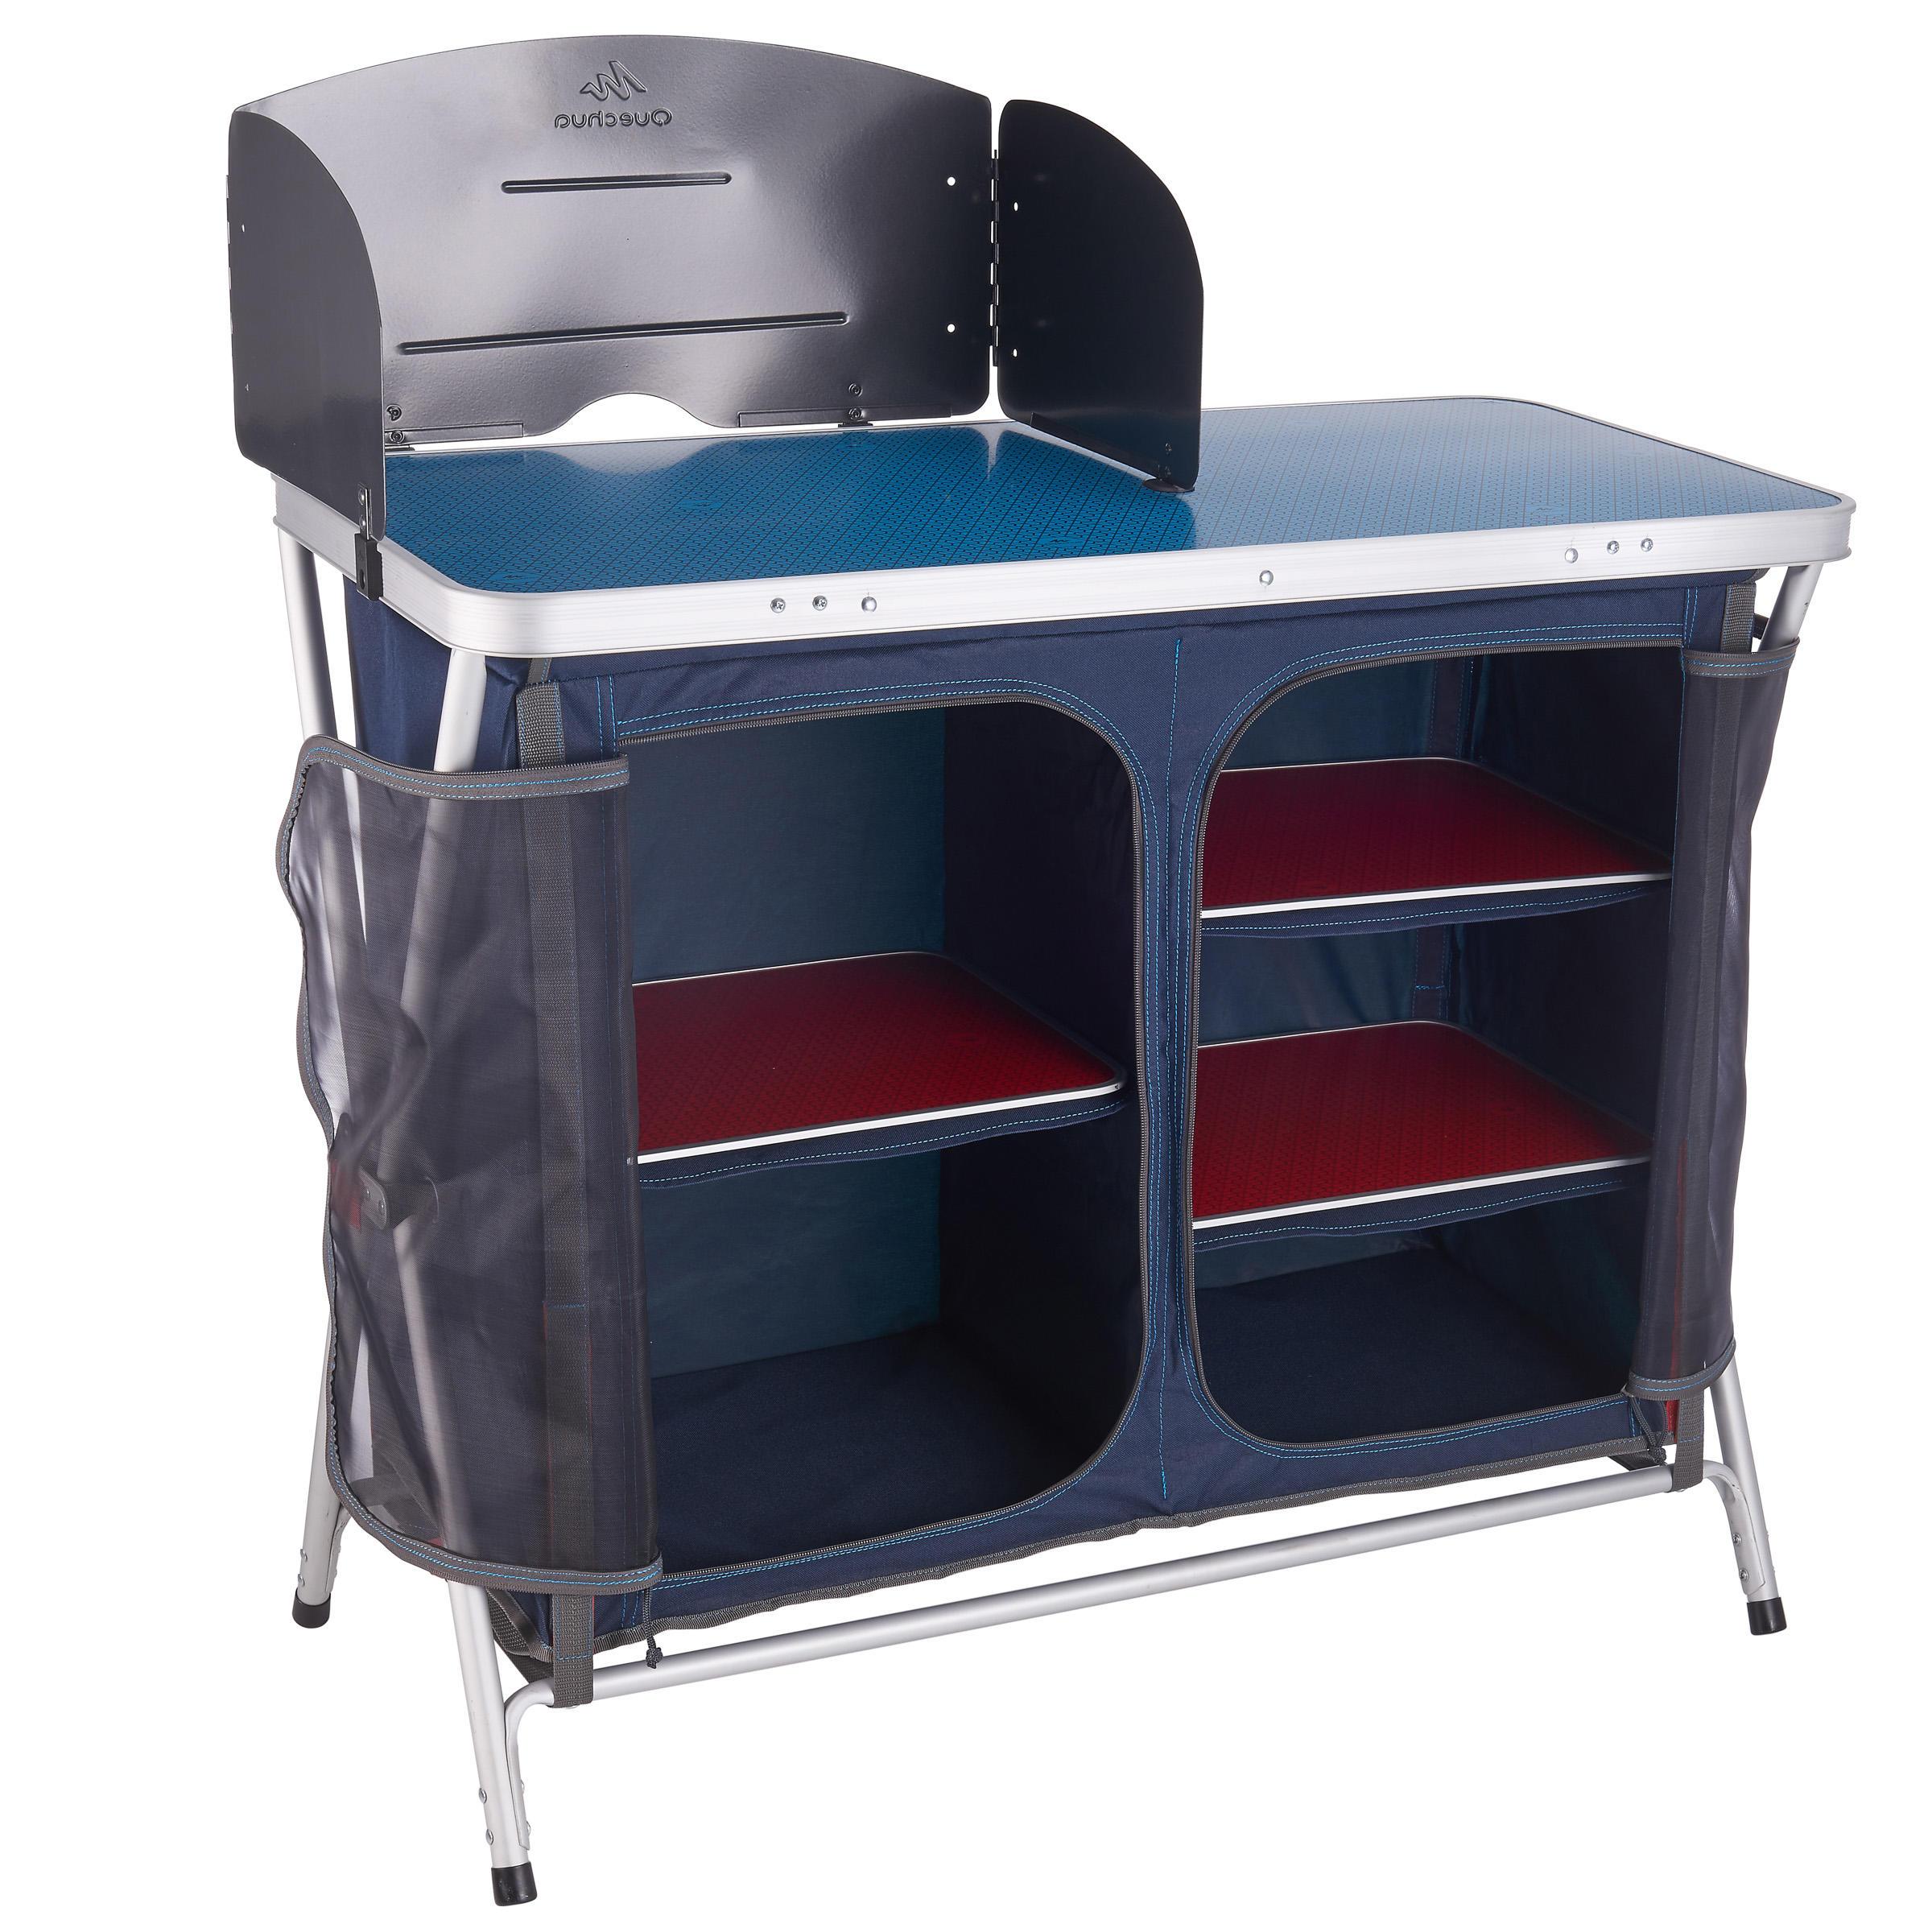 Camping/Hiking Kitchen Unit - Blue